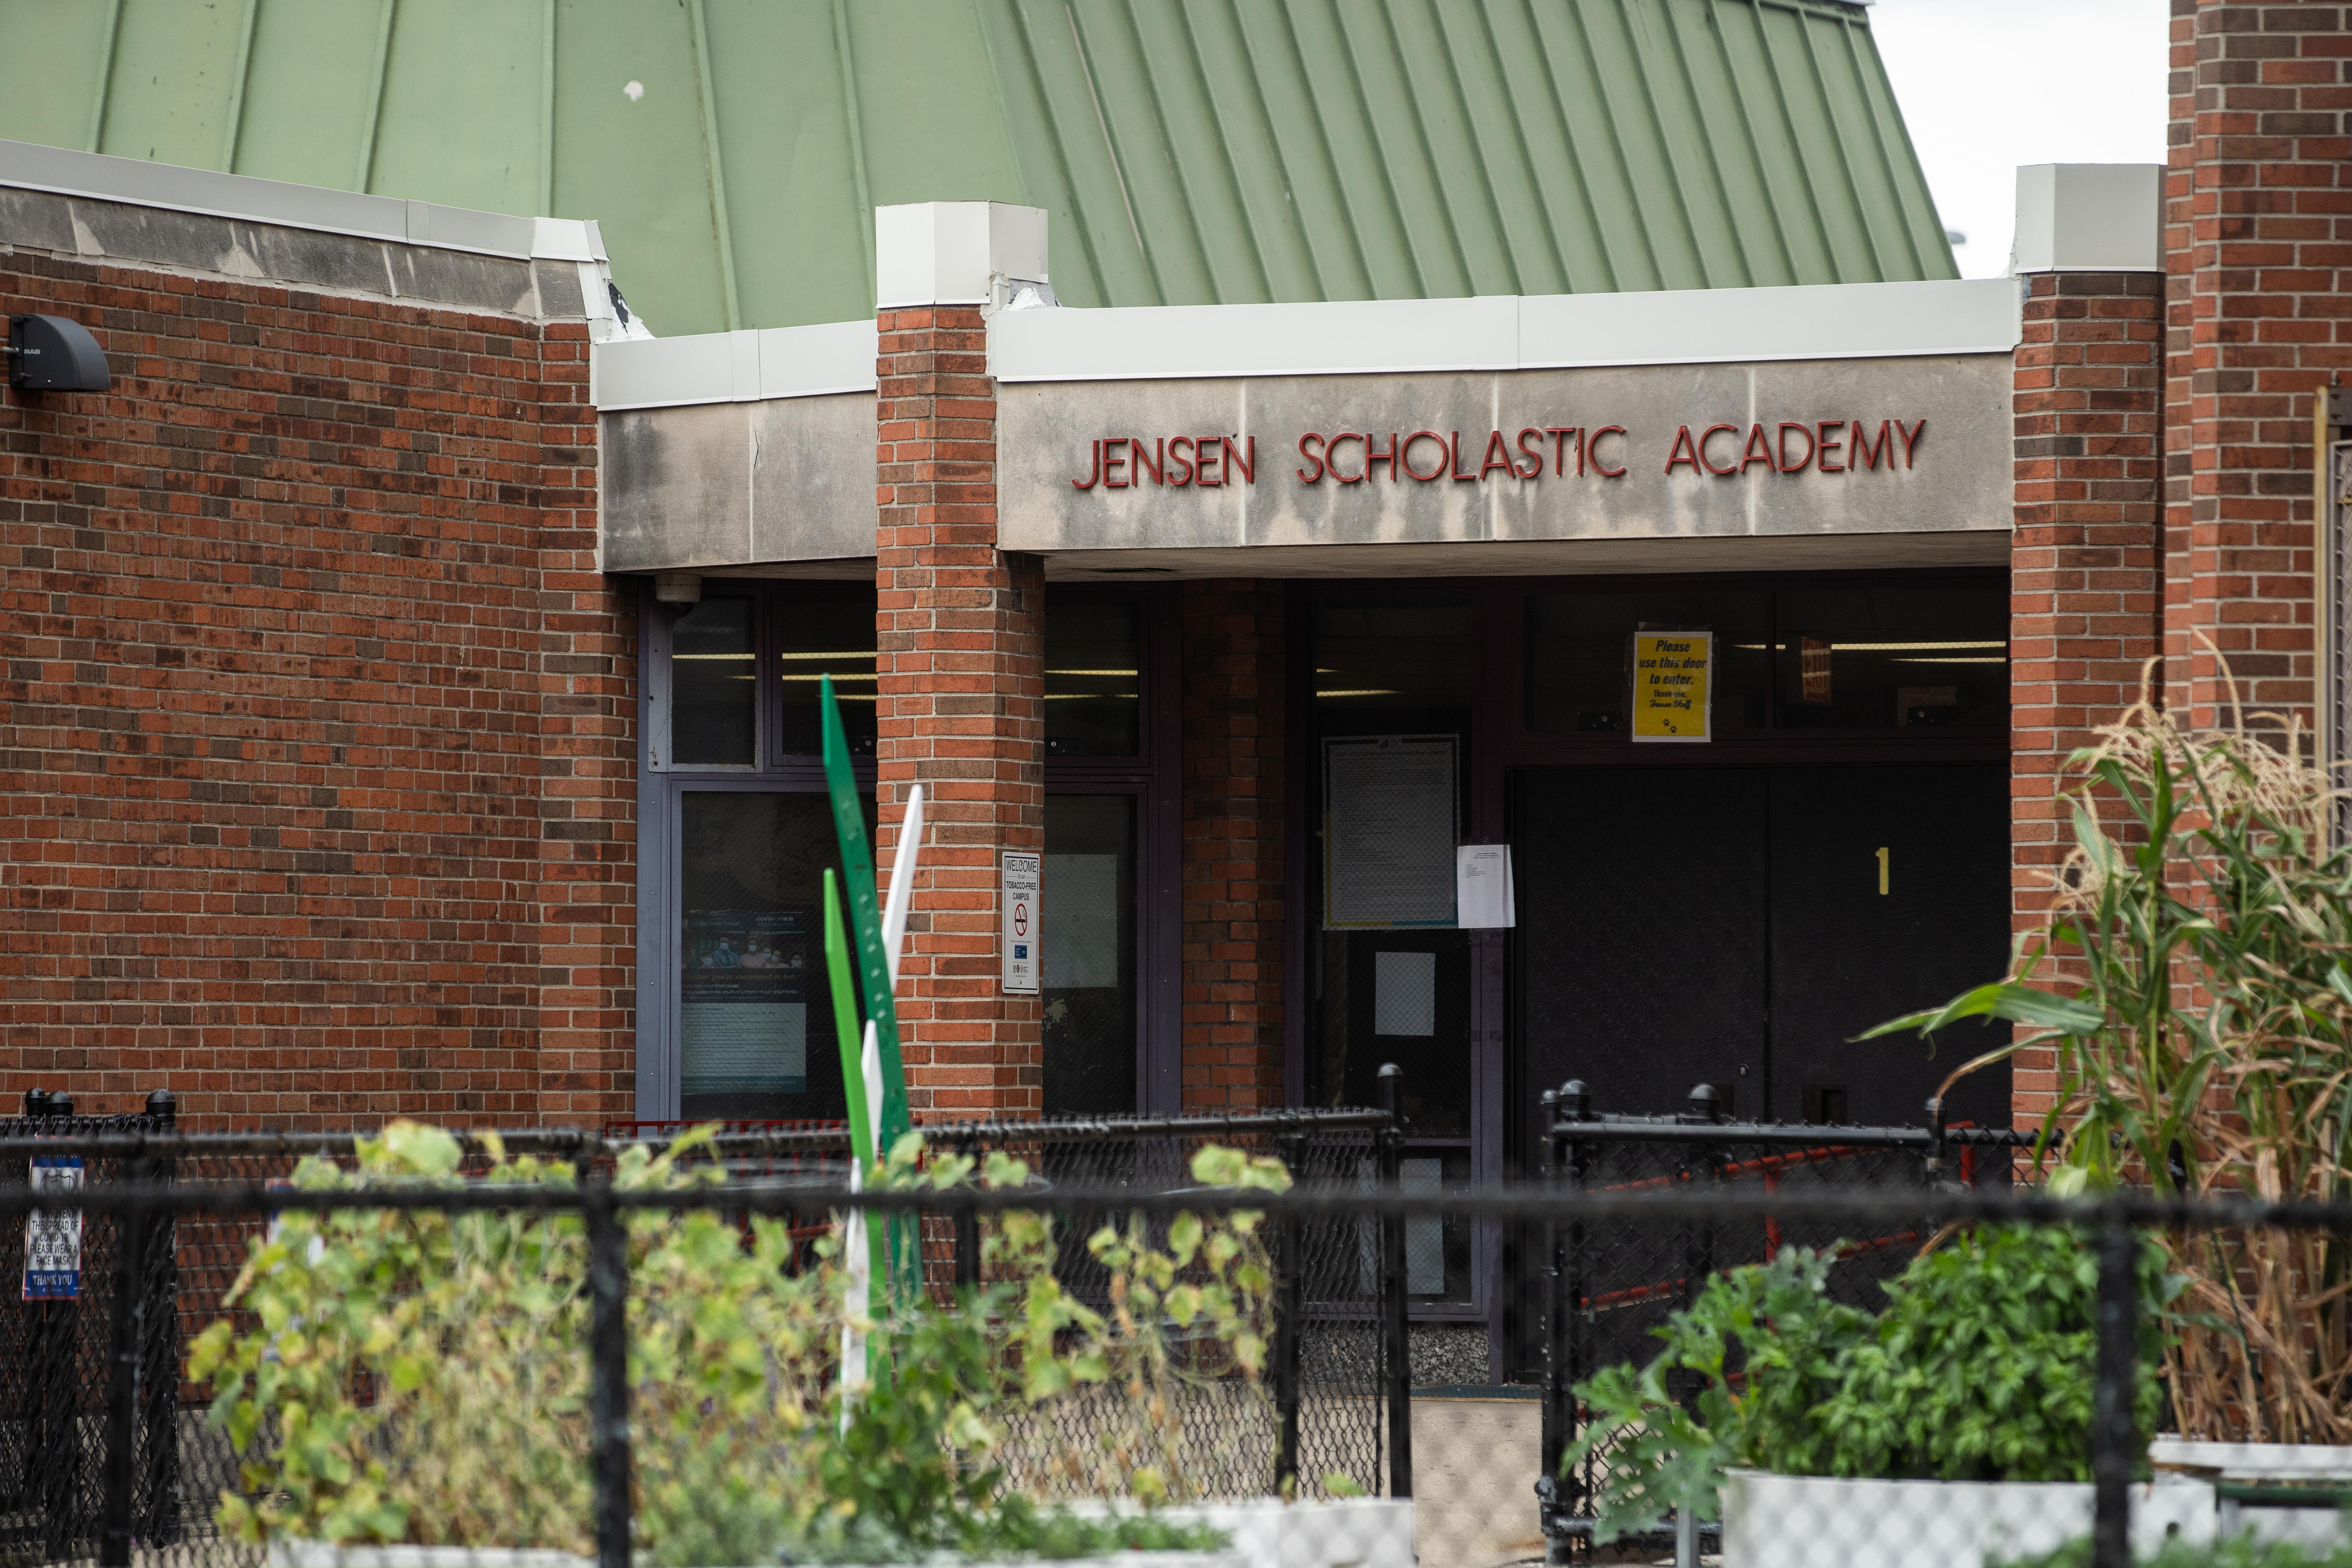 Jens Jensen Public School, at 3030 W. Harrison St., on Wednesday afternoon, Sept. 22, 2021.